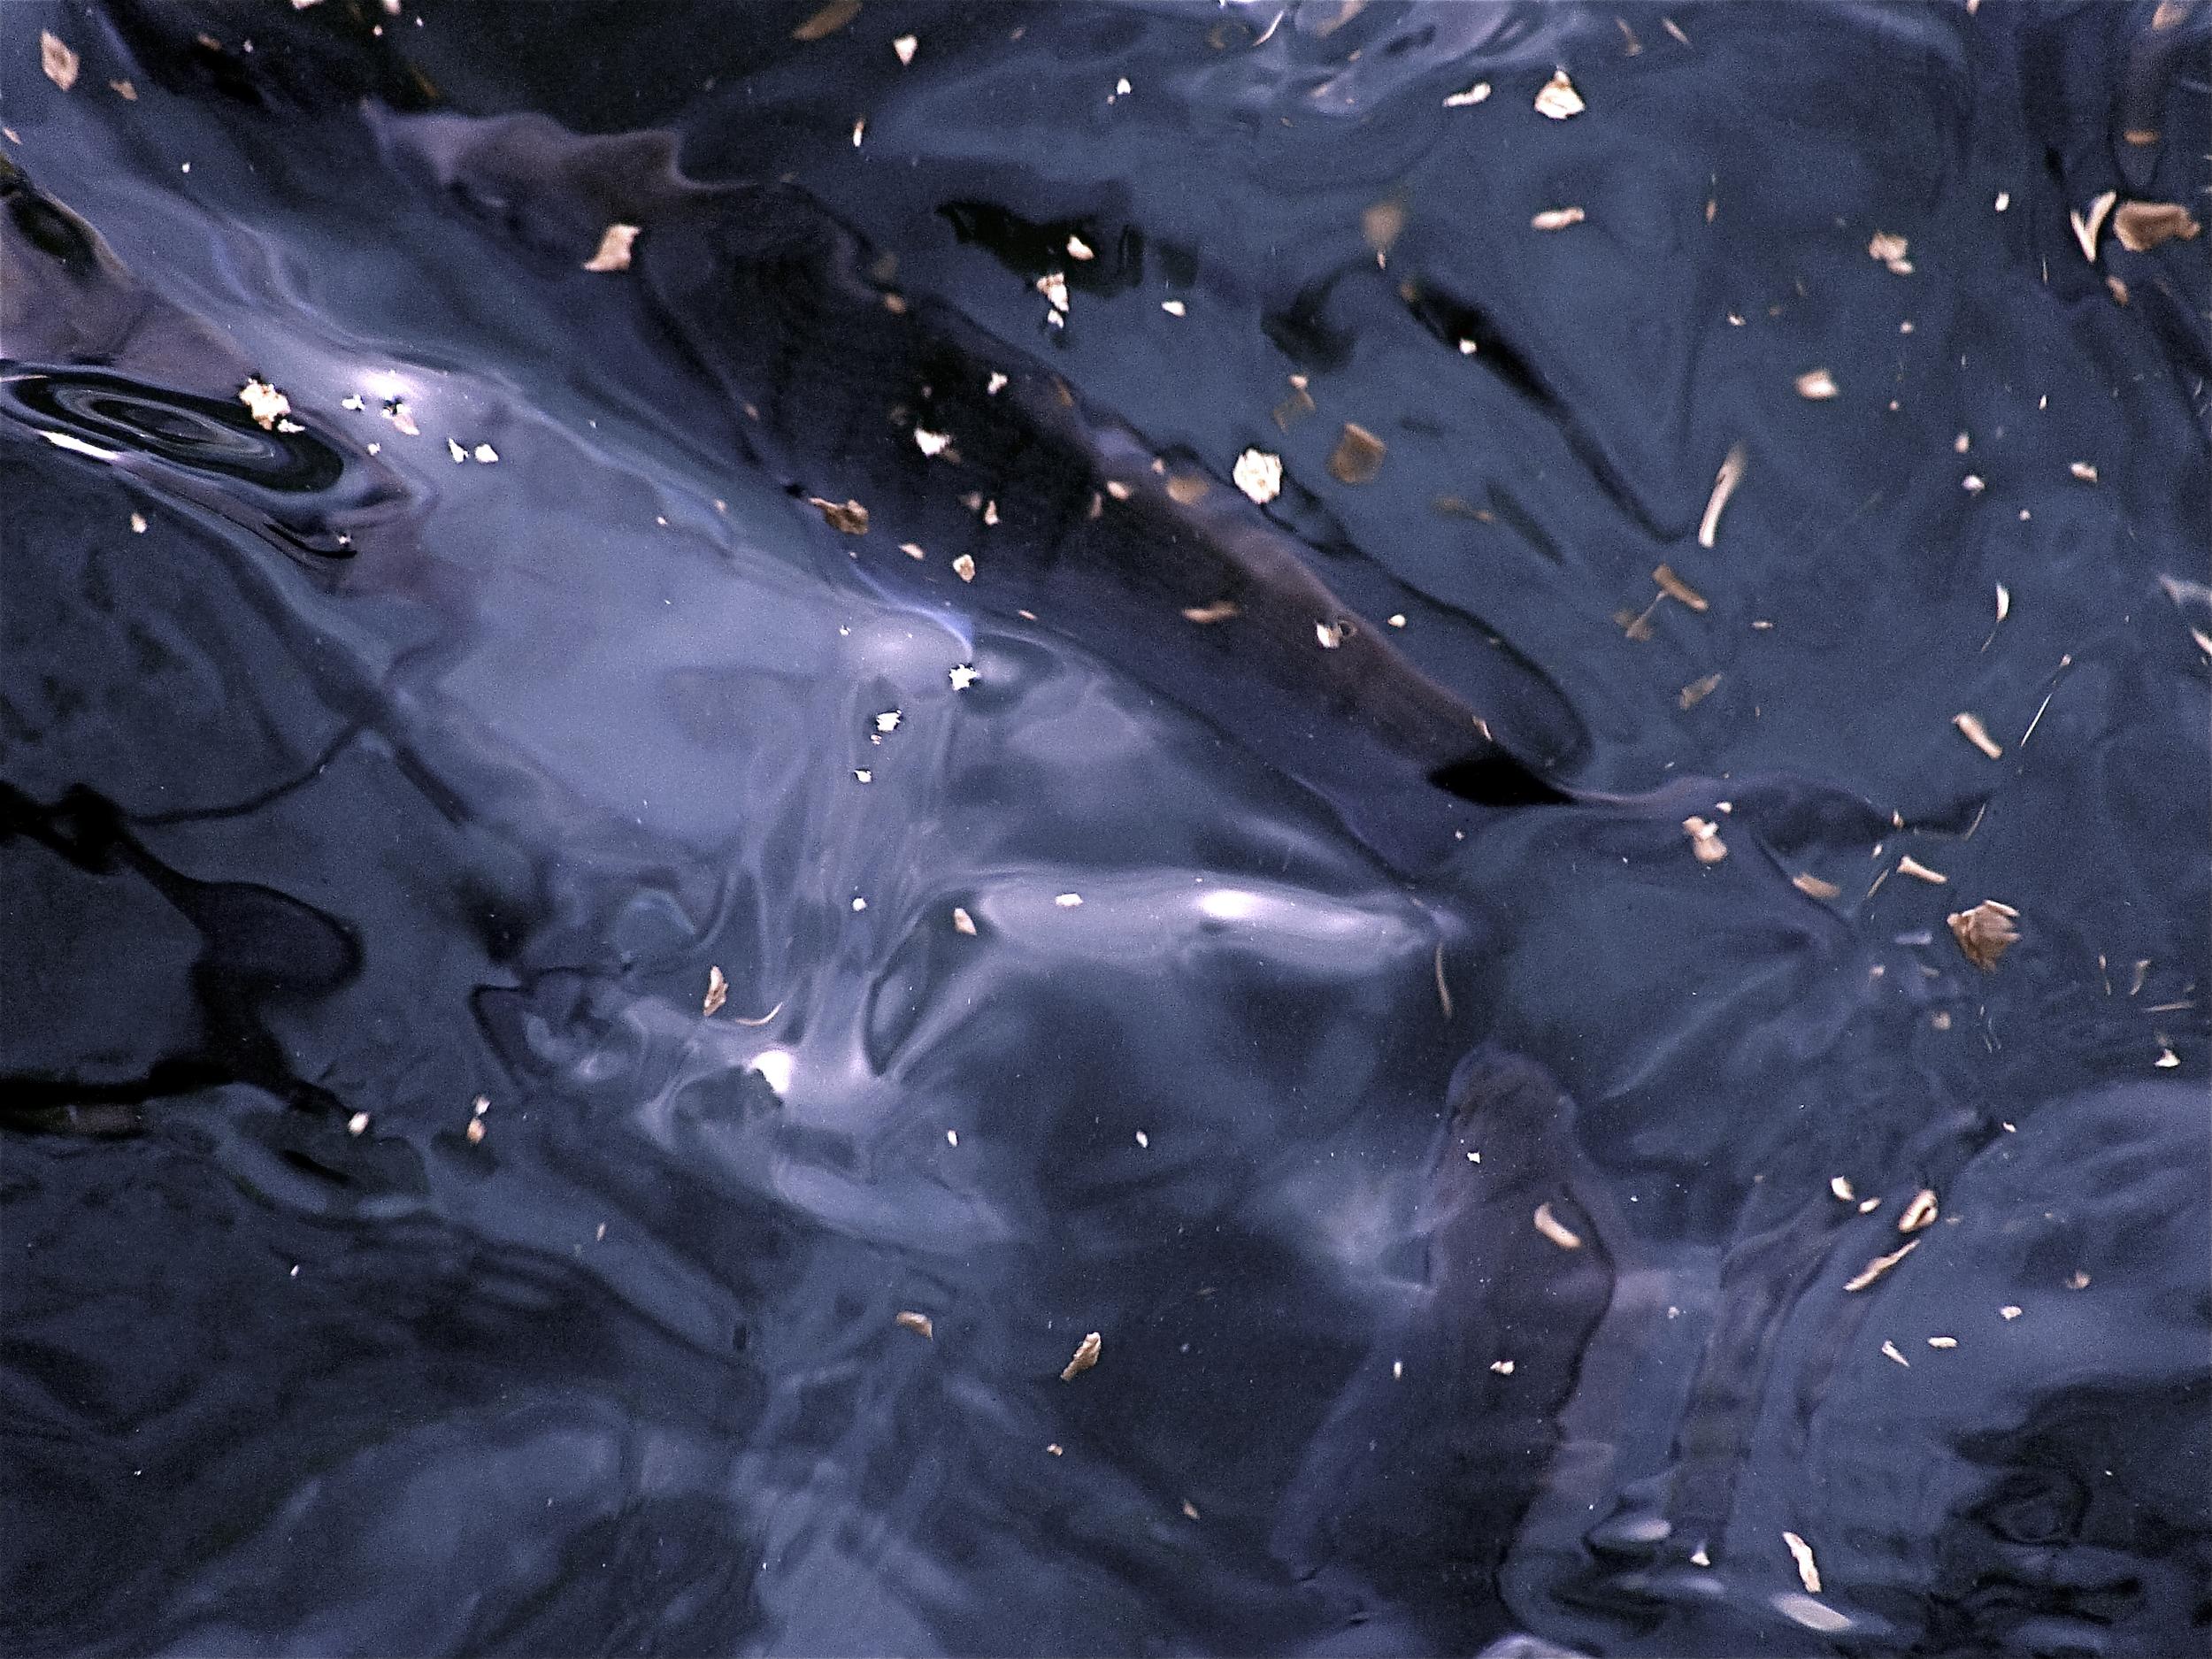 NE_Water_017.jpg